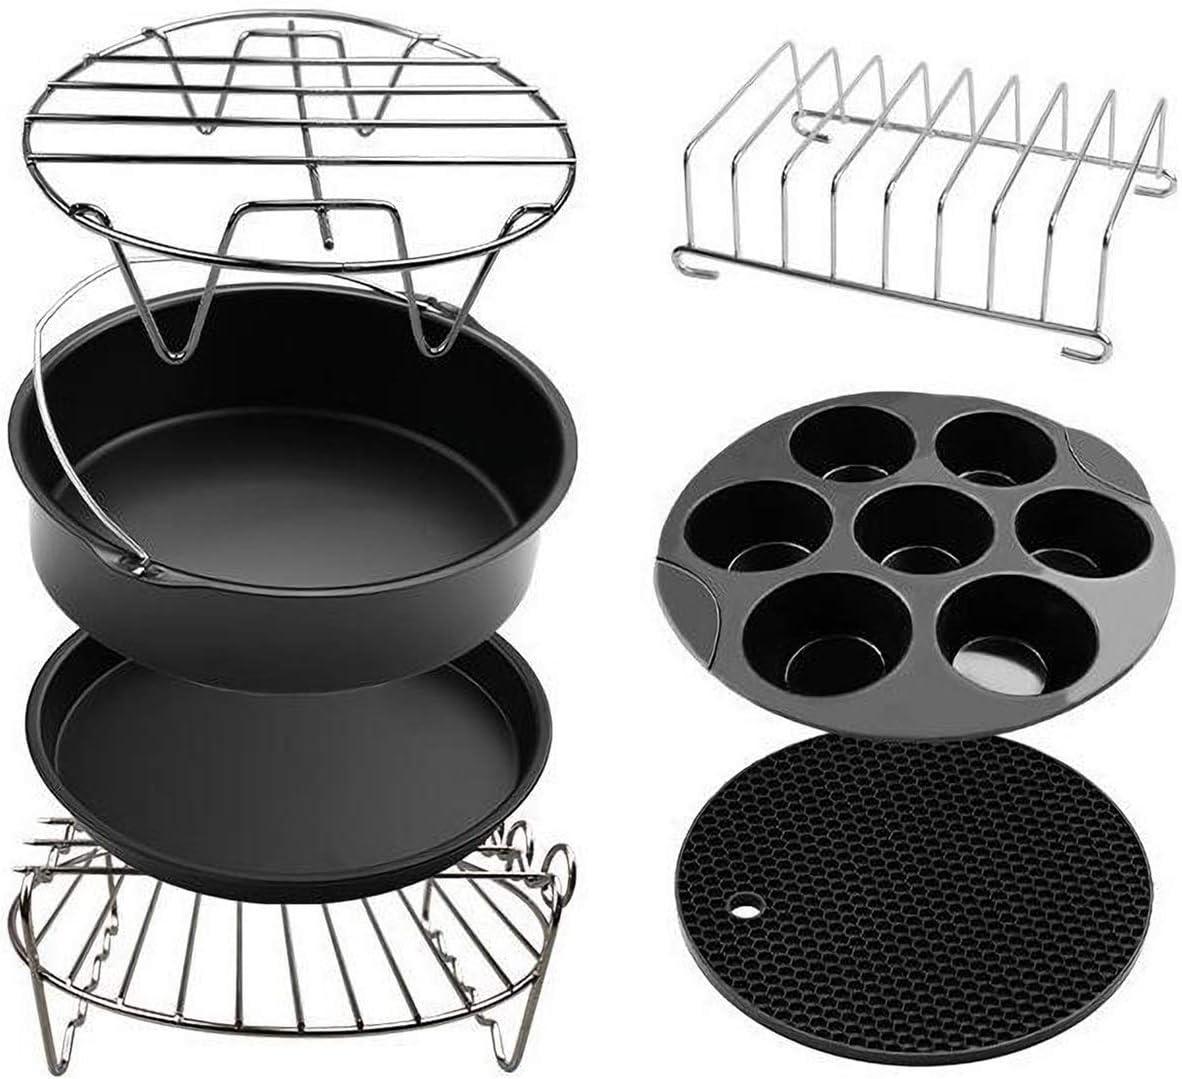 JZJSZB Air Fryer Accessories, Set of 7 Fit All 4.8QT - 6.3QT Air Fryers, BPA Free, Nonstick Coating, 8 Inch Air Fryer Accessories Set